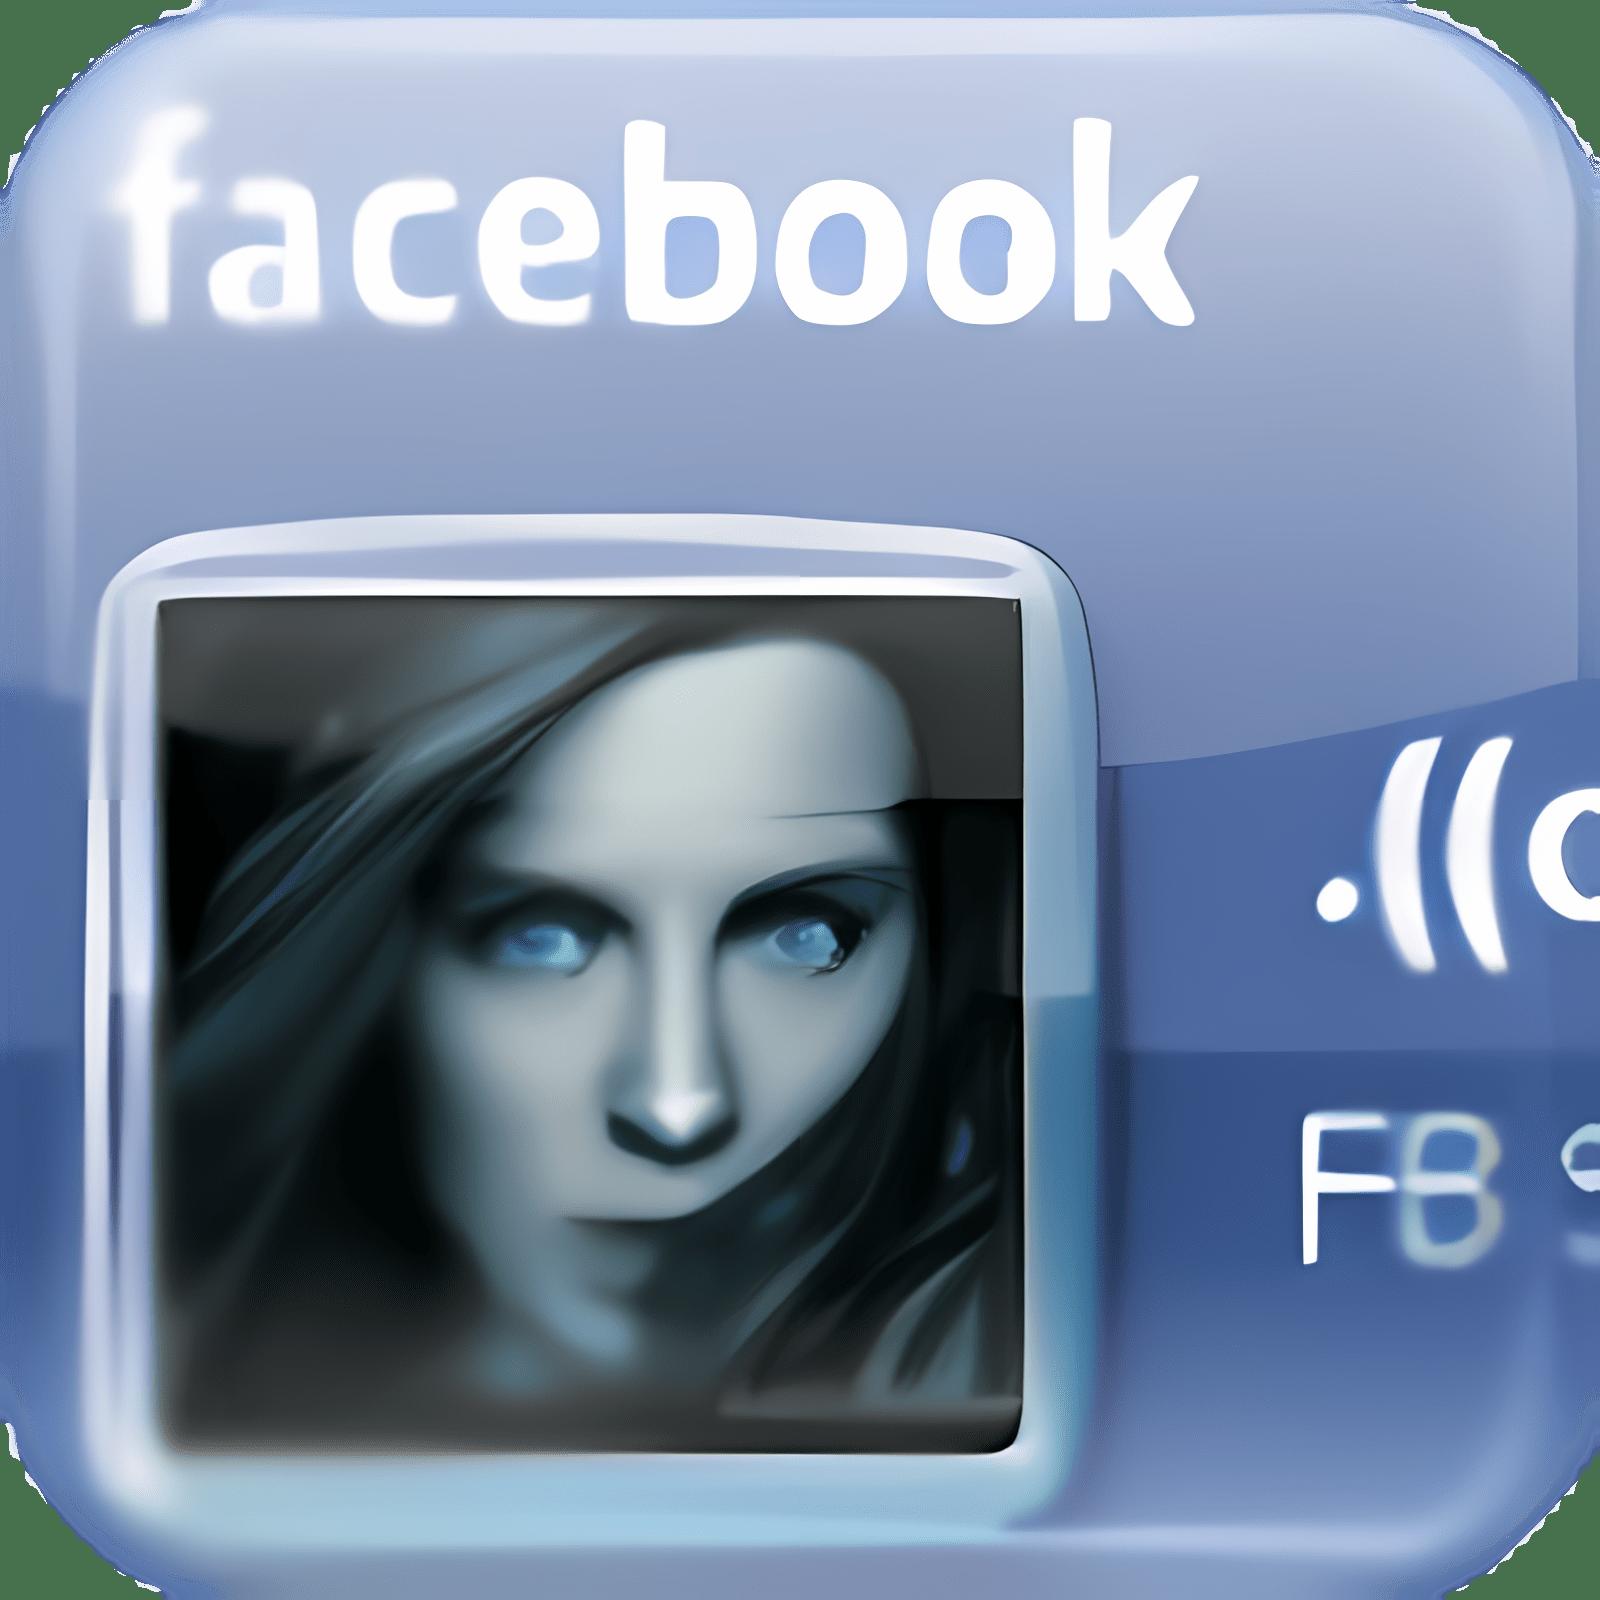 Facebook skin